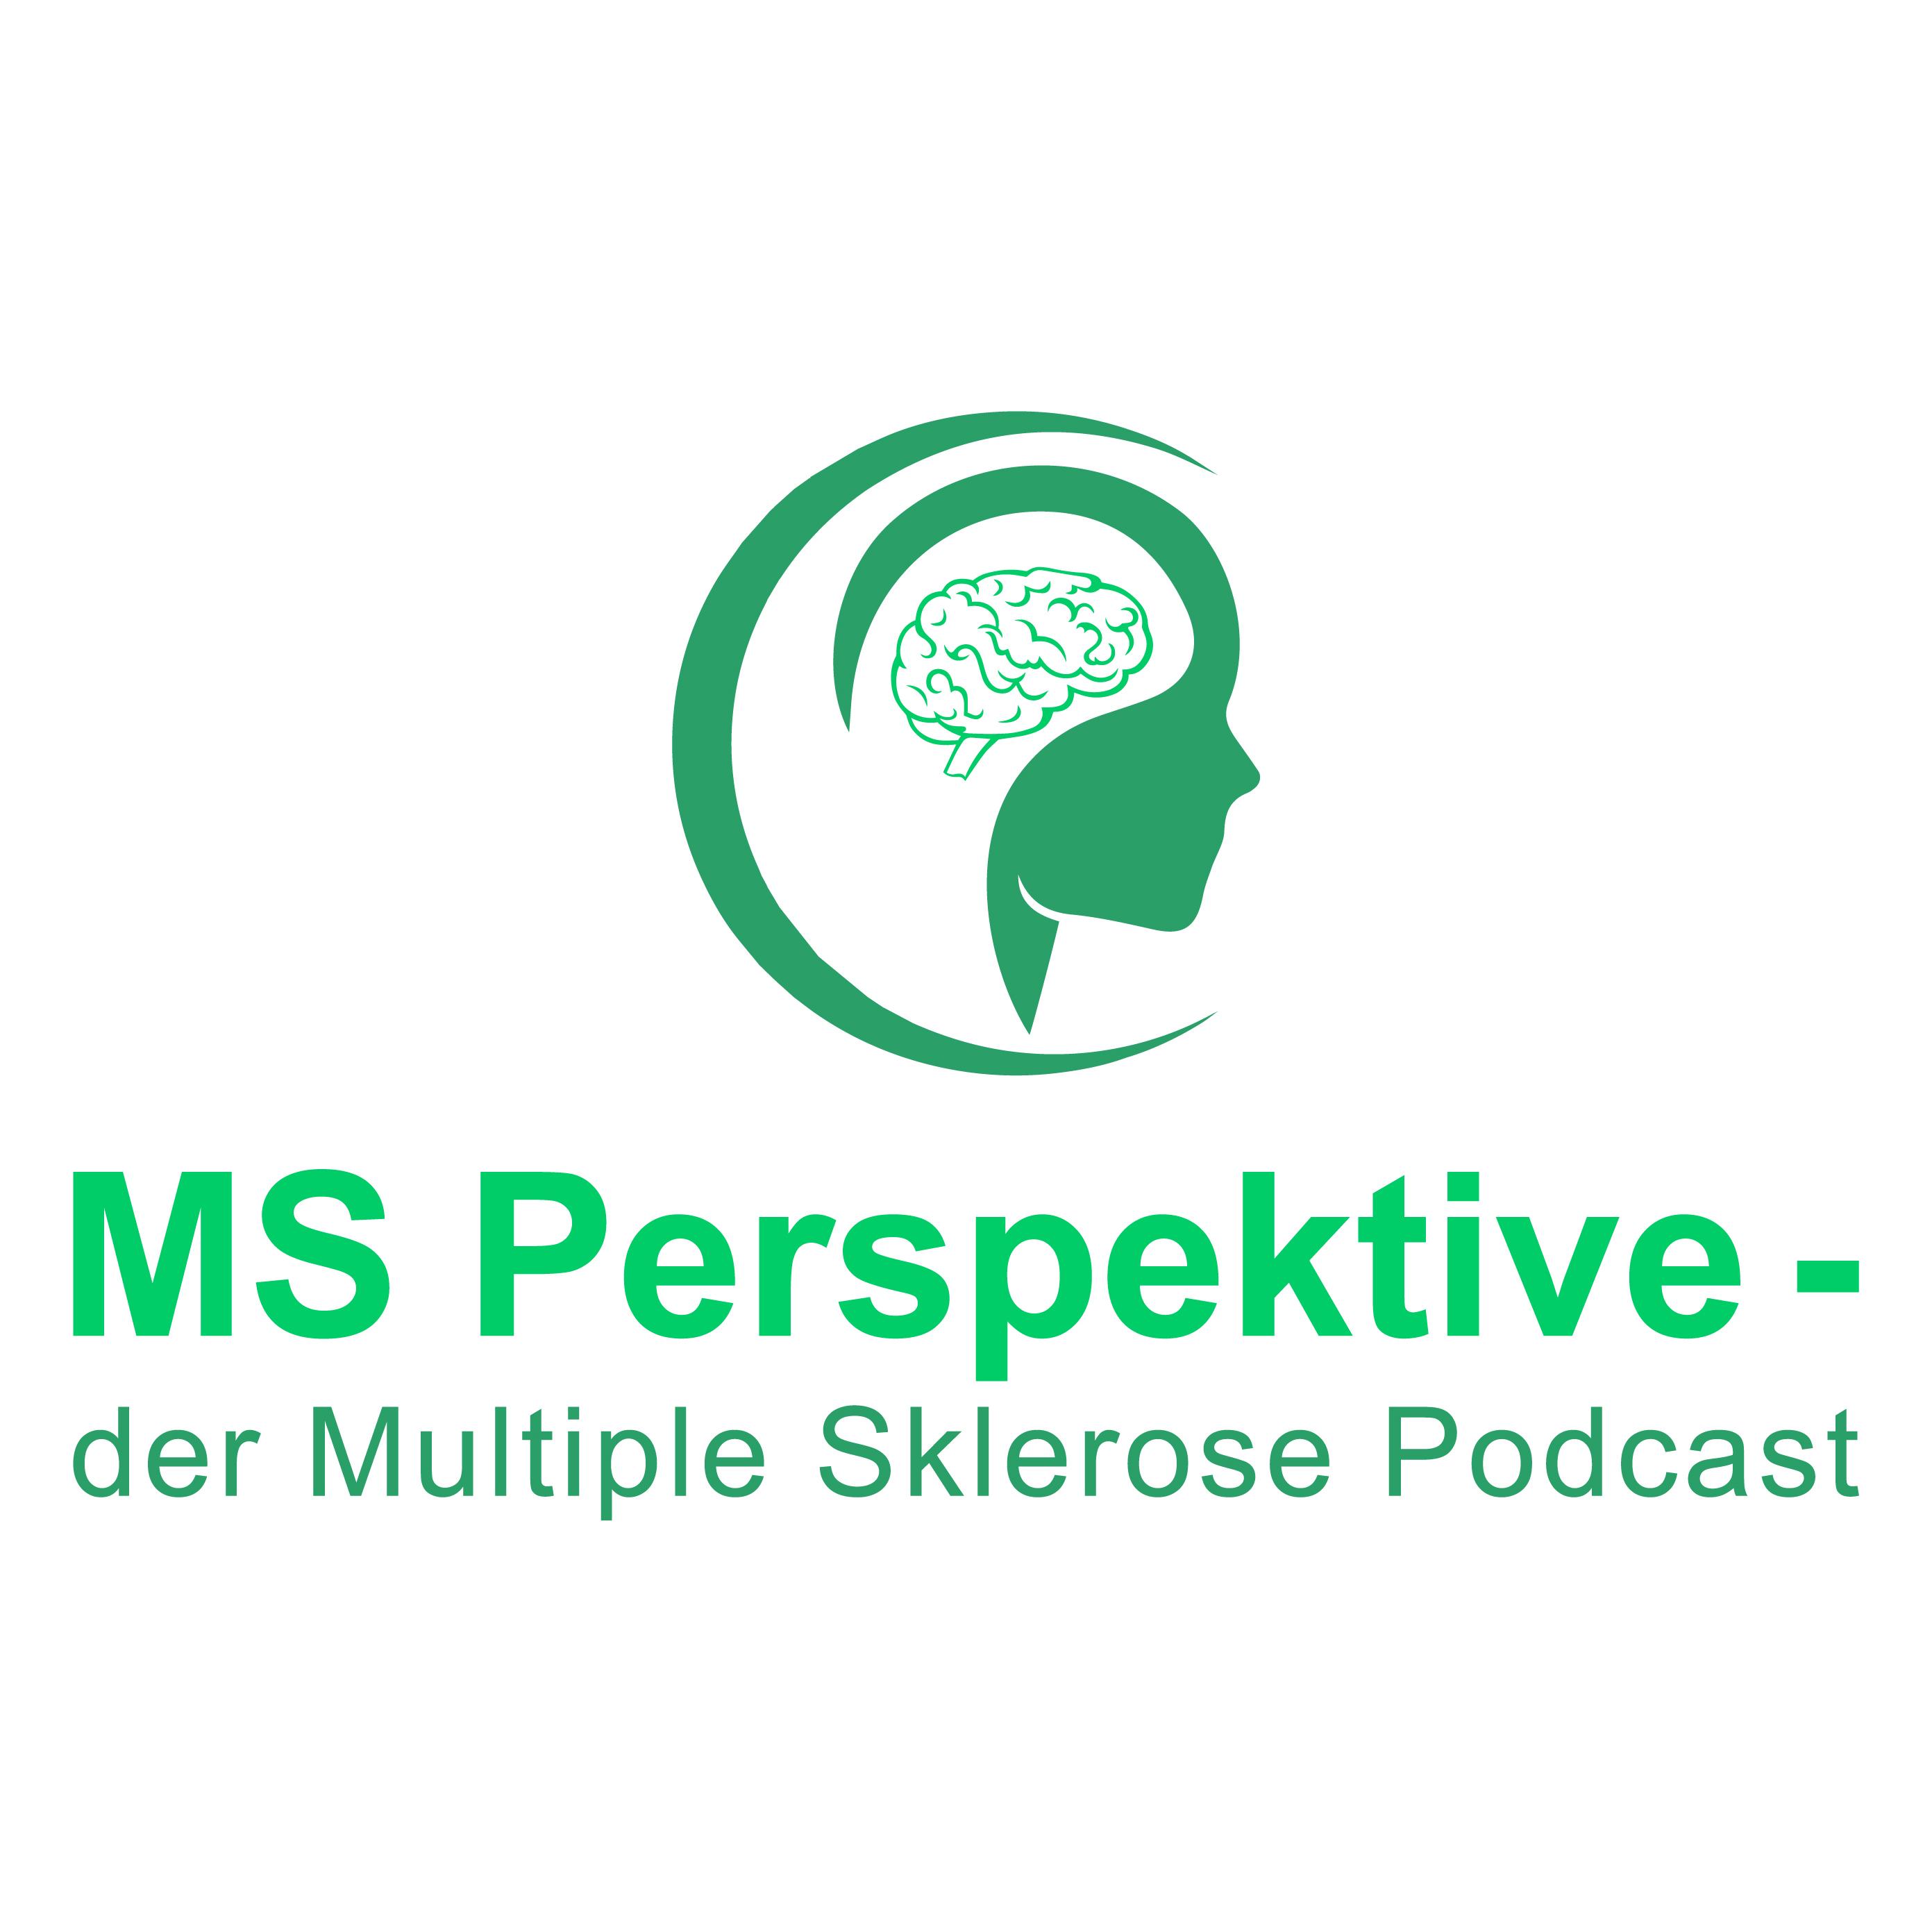 MS-Perspektive - der Multiple Sklerose Podcast mit Nele Handwerker